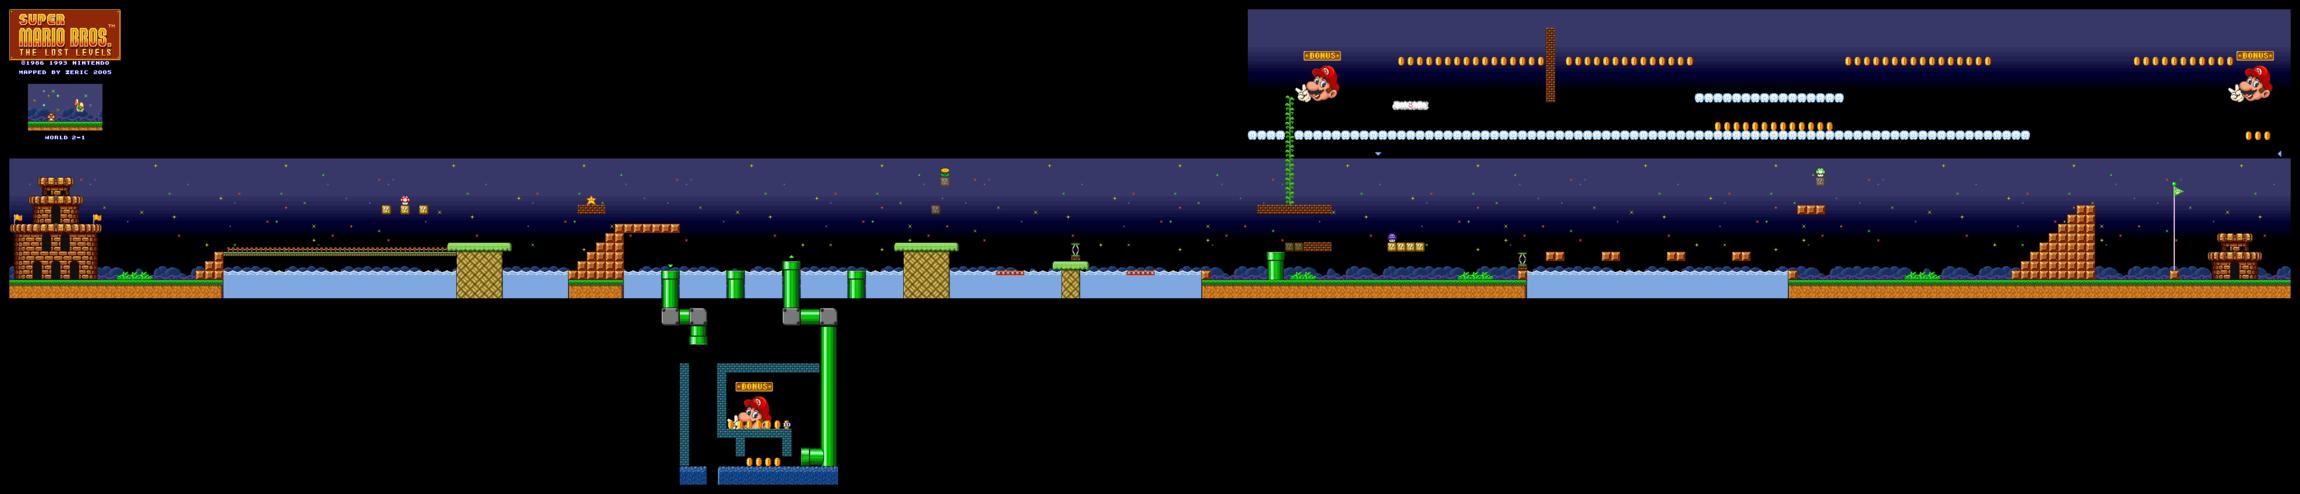 Map of World 2-1 (Super Mario All-Stars version)